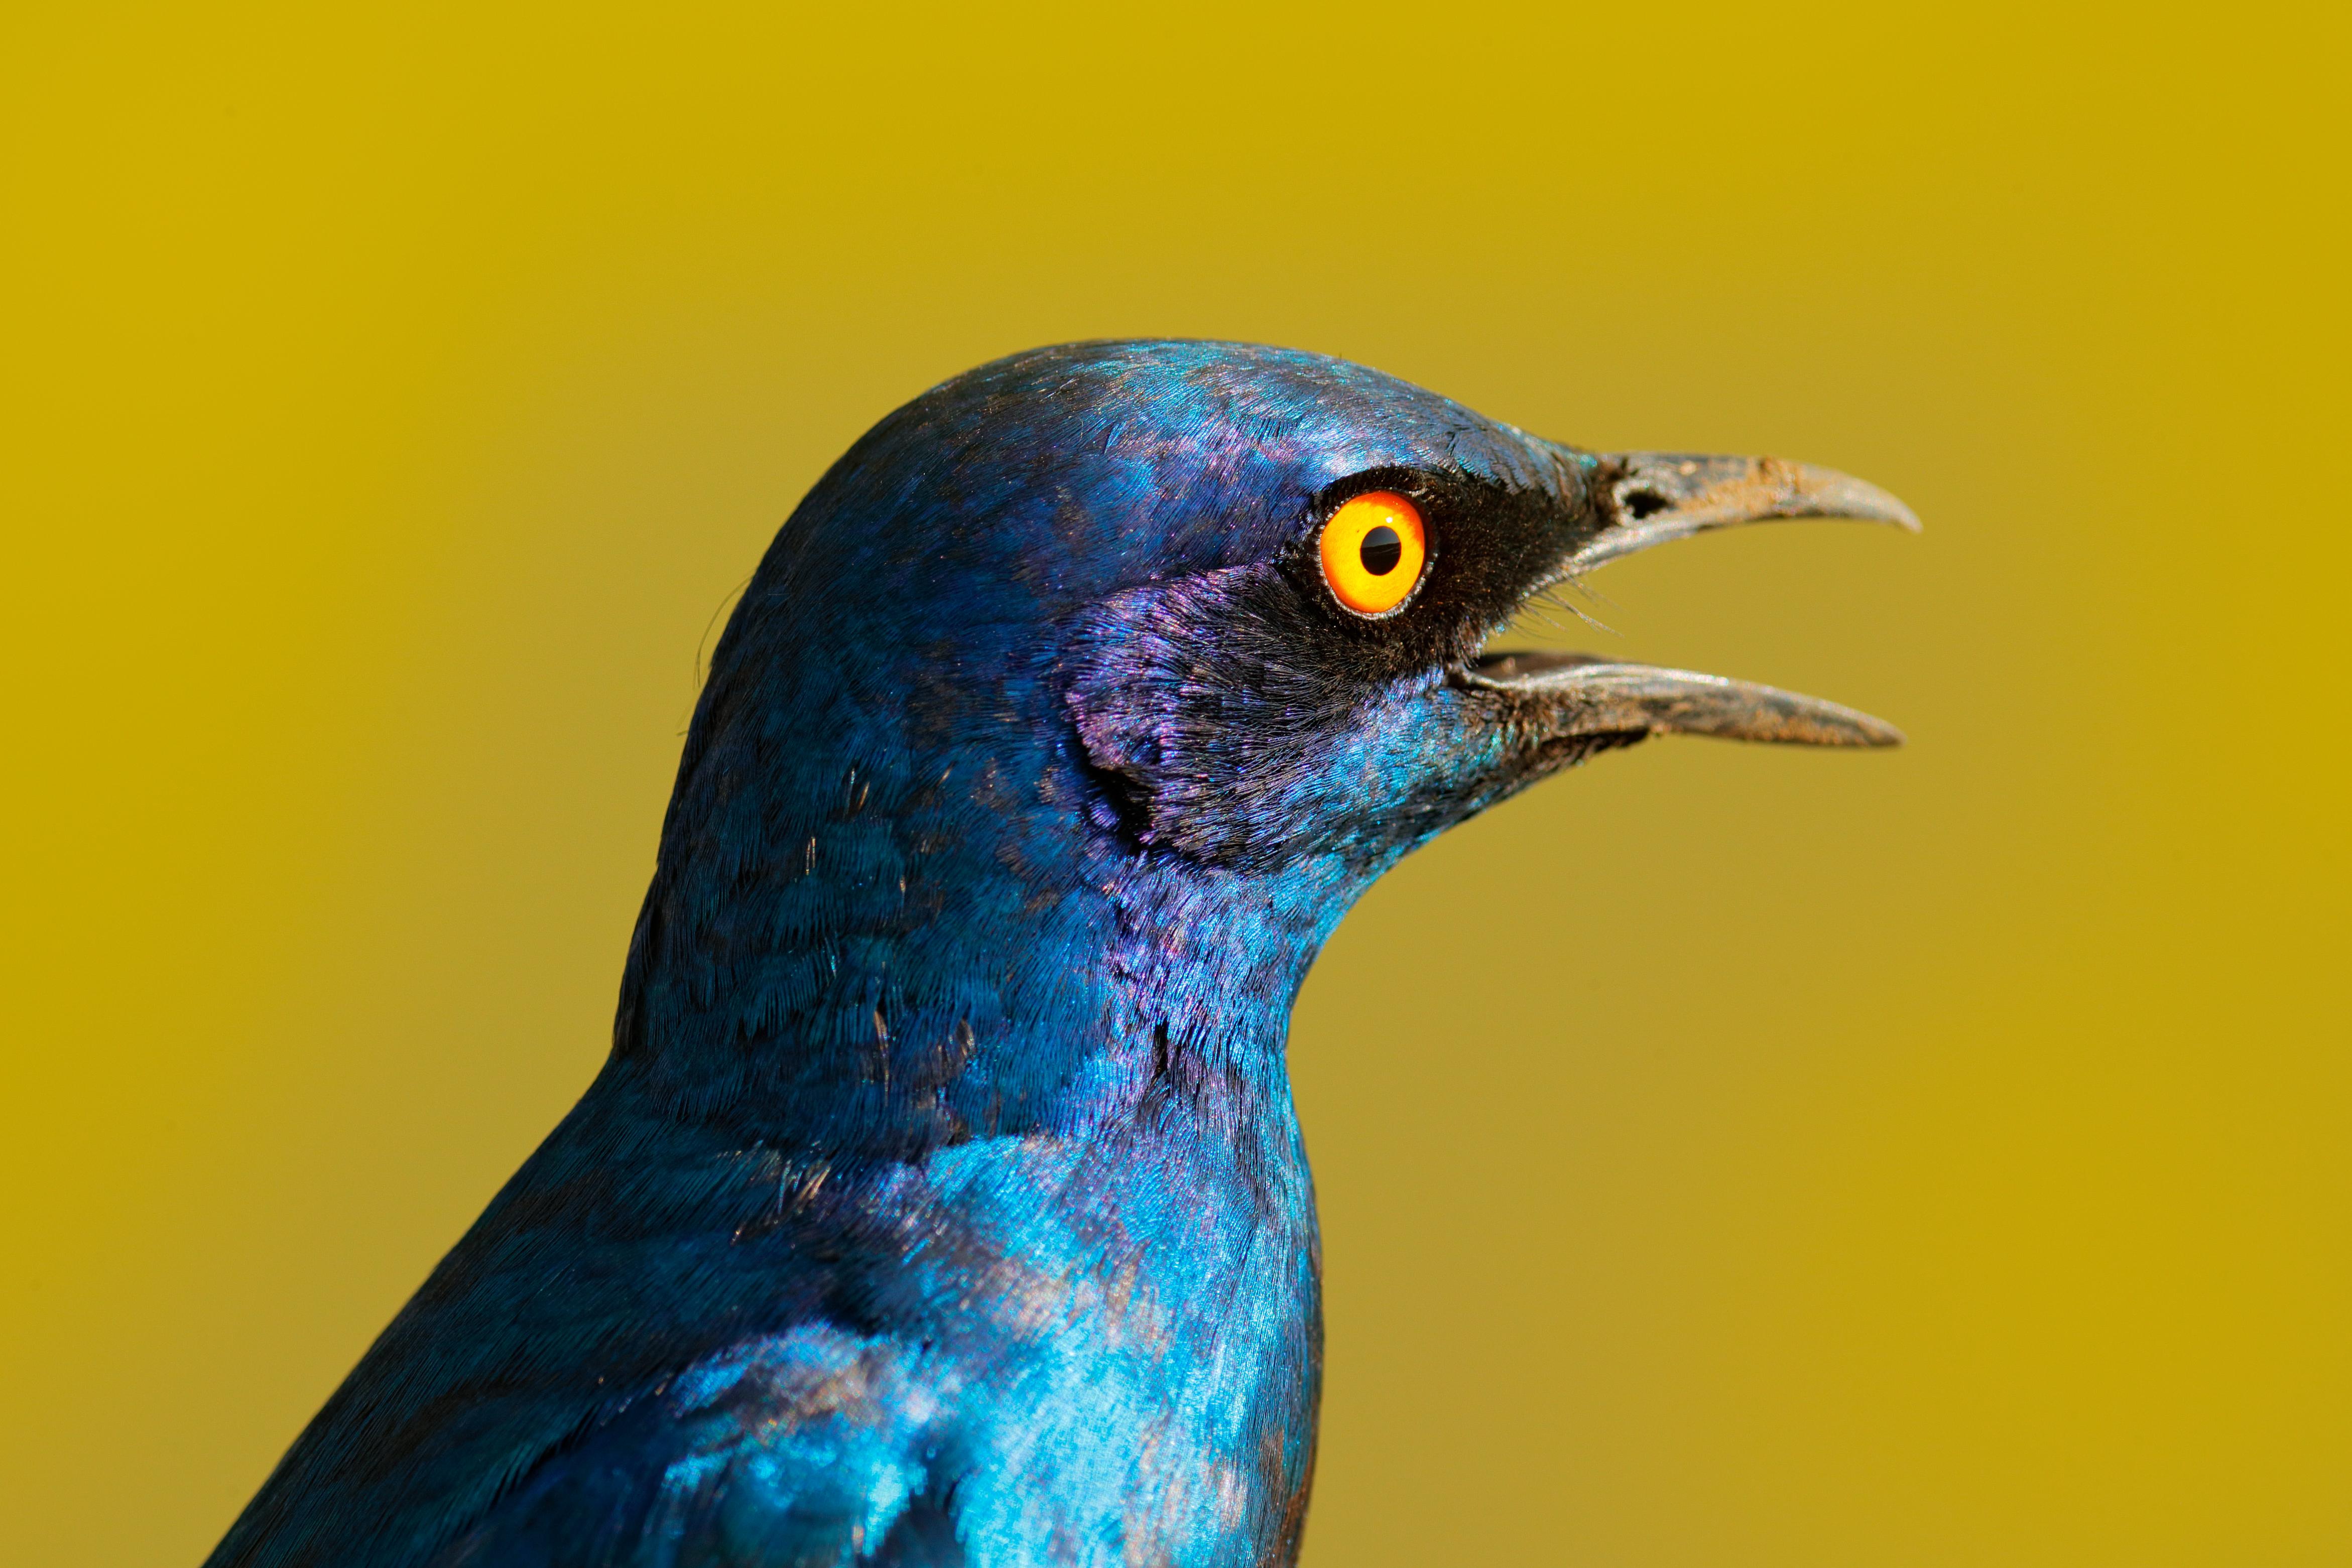 Special camera simulates birds' color vision